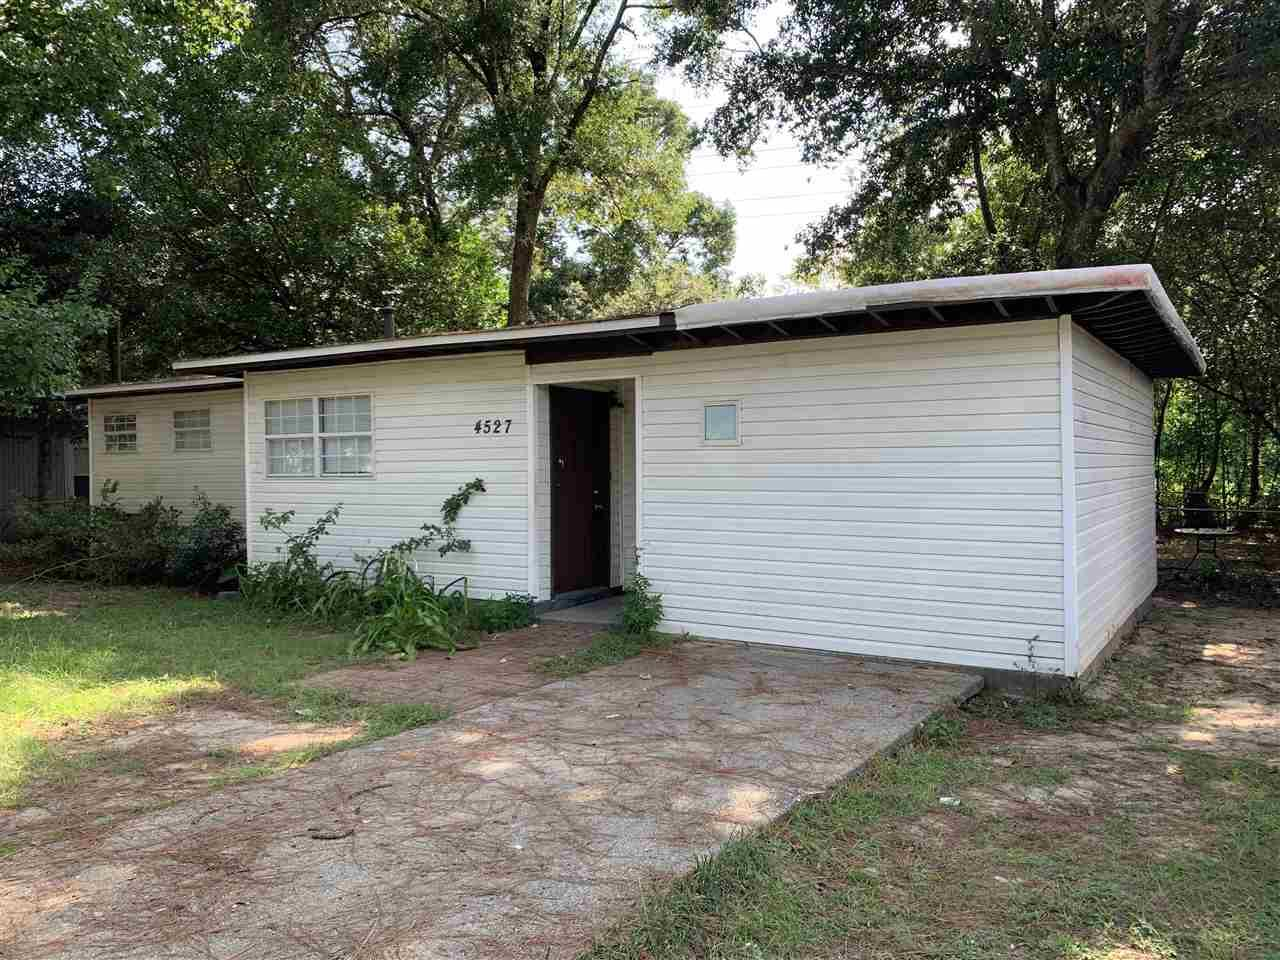 4527 VERSAILLES DR, Pensacola, Florida